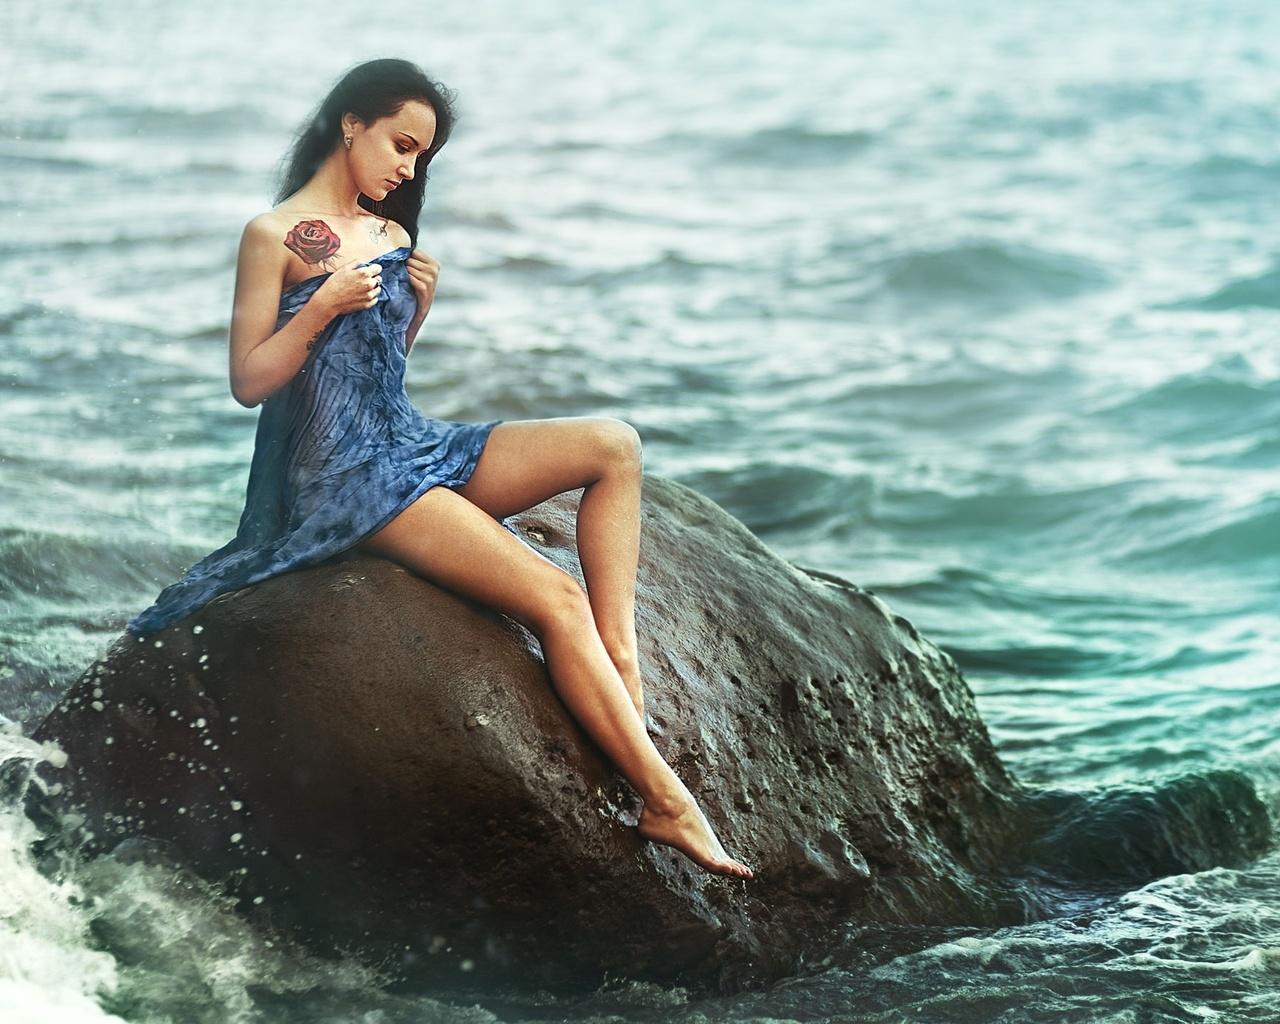 Фото девушек на фоне океана, Фото: Девушка на фоне океана 26 фотография